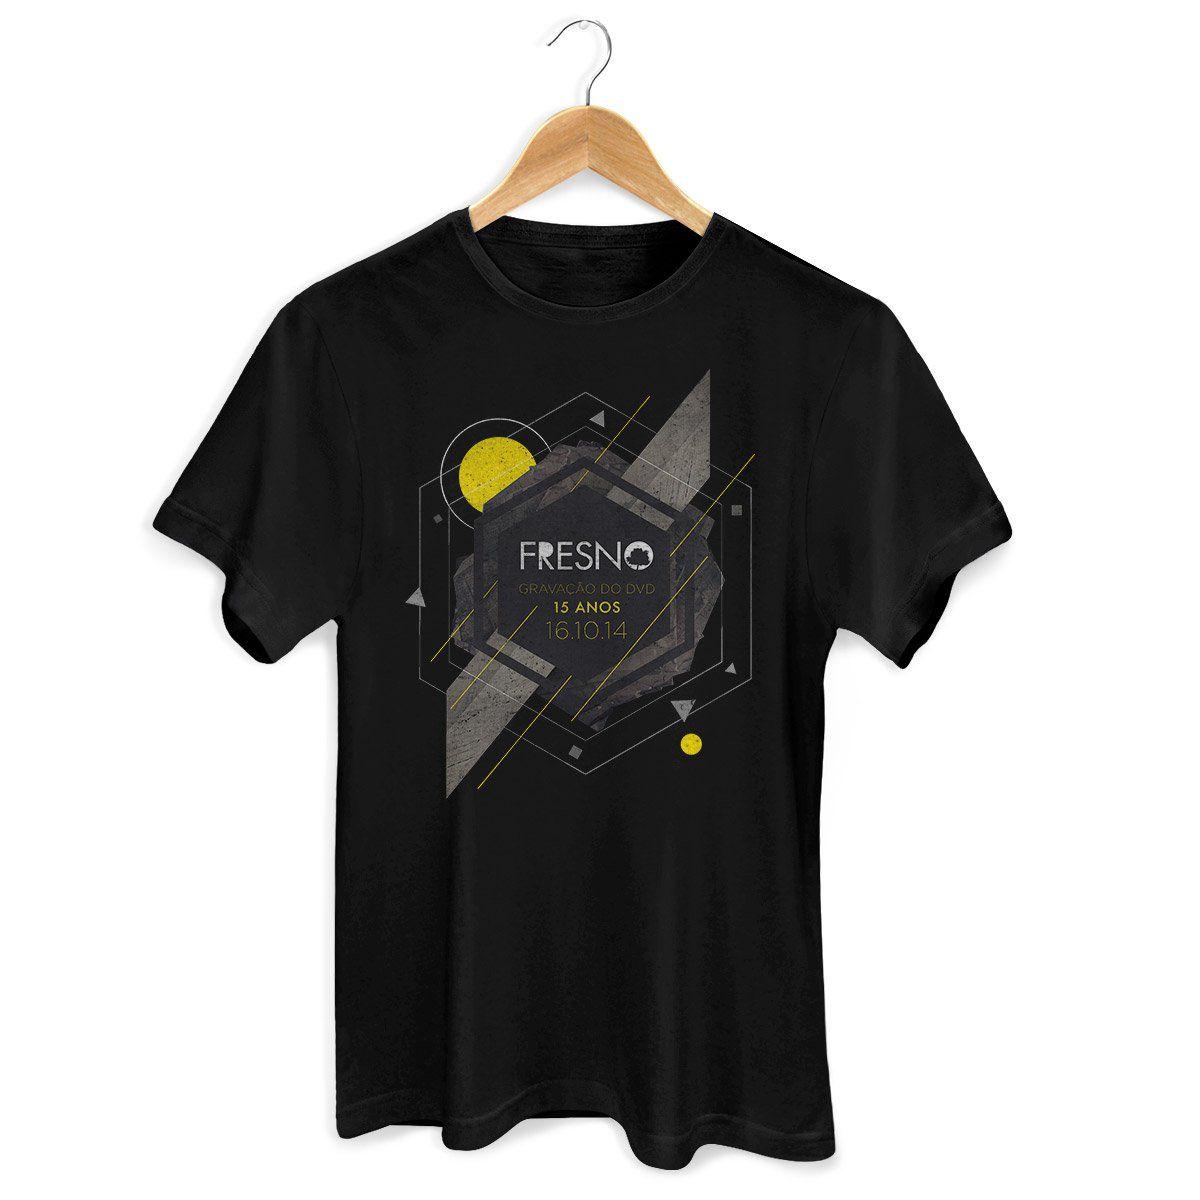 Camiseta Masculina Fresno 15 Anos